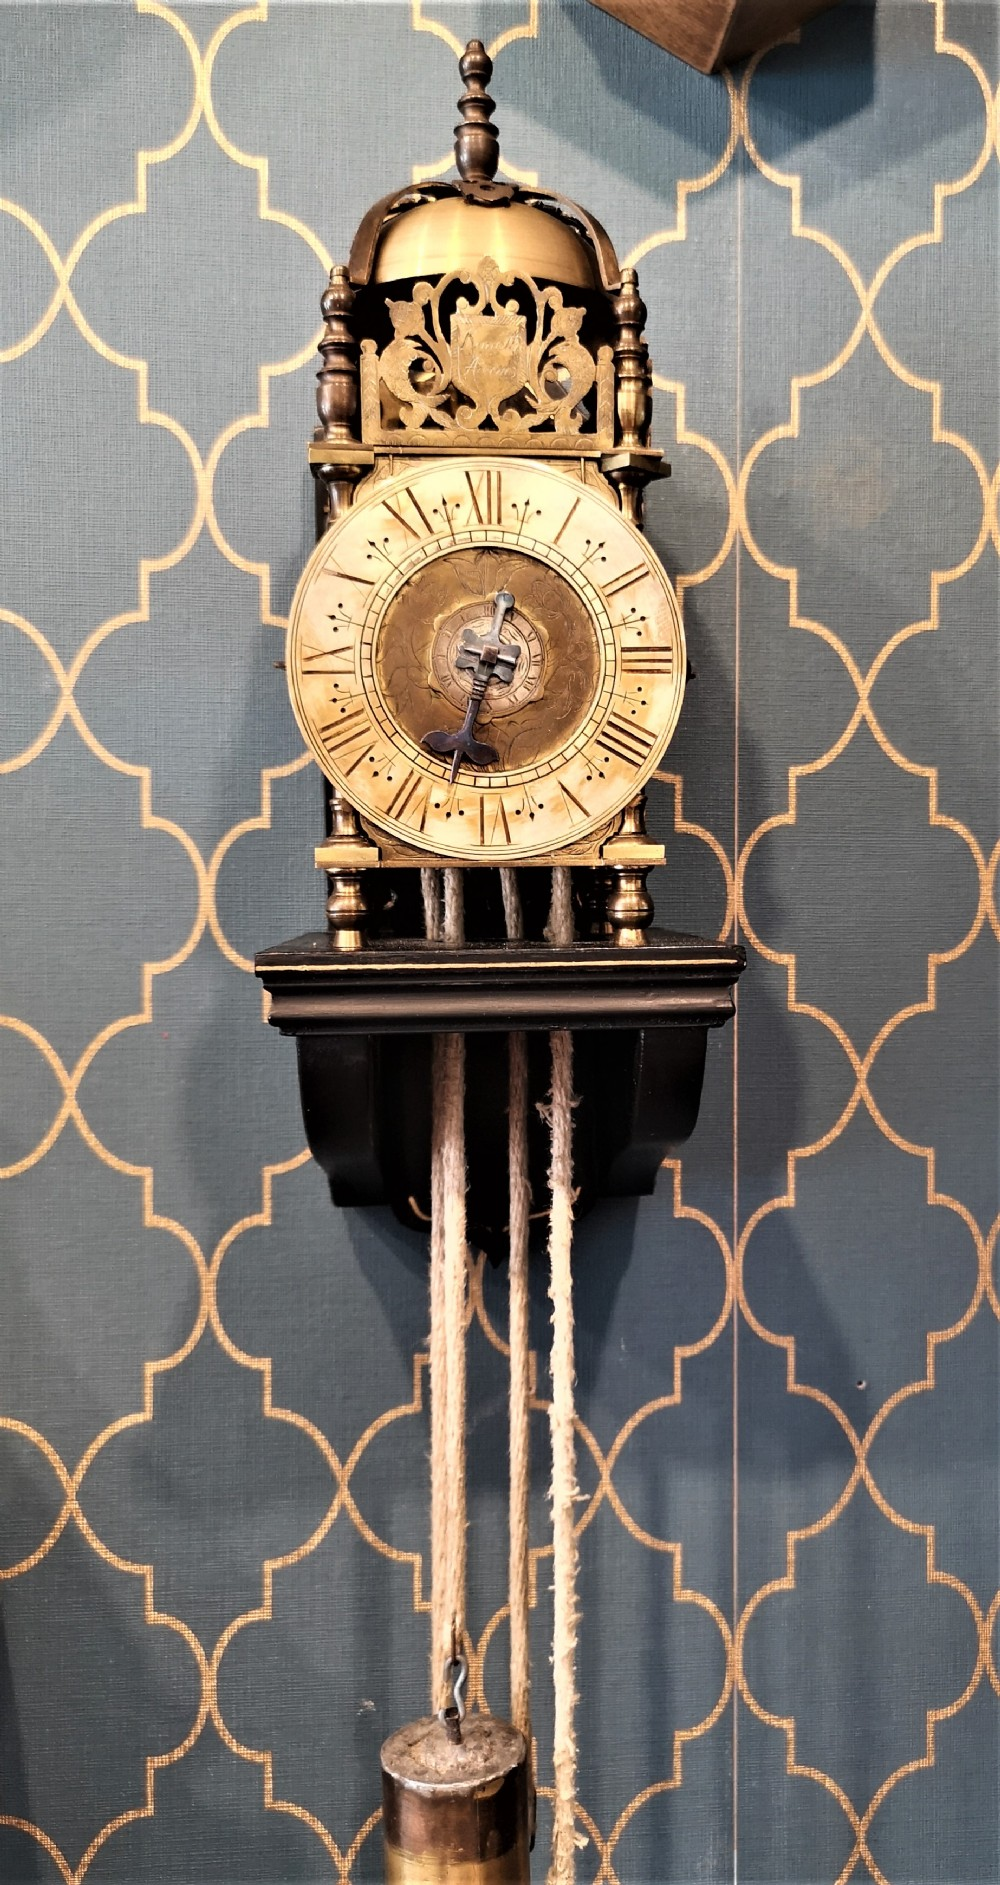 miniature verge lantern clock